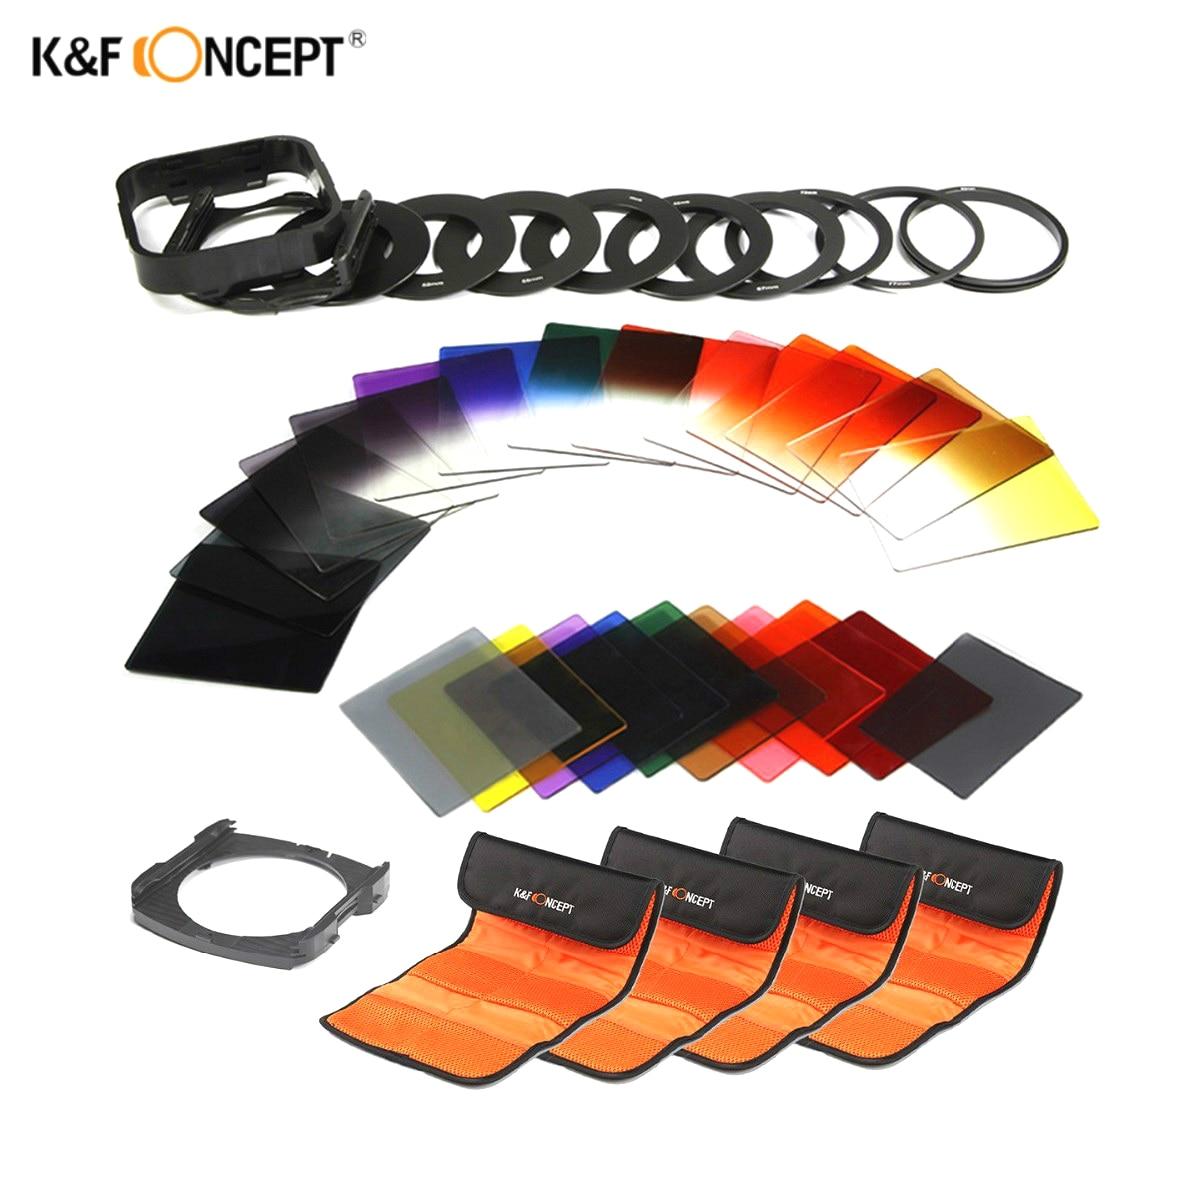 K&F CONCEPT 40 In1 ND2 ND4 Fader Gradual Gray Color Lens Filter Set For Canon 6d 550d 600d 700d Nikon D3100 D3300 SONY Camera литой диск replica legeartis concept ns512 6 5x16 5x114 3 et40 d66 1 bkf